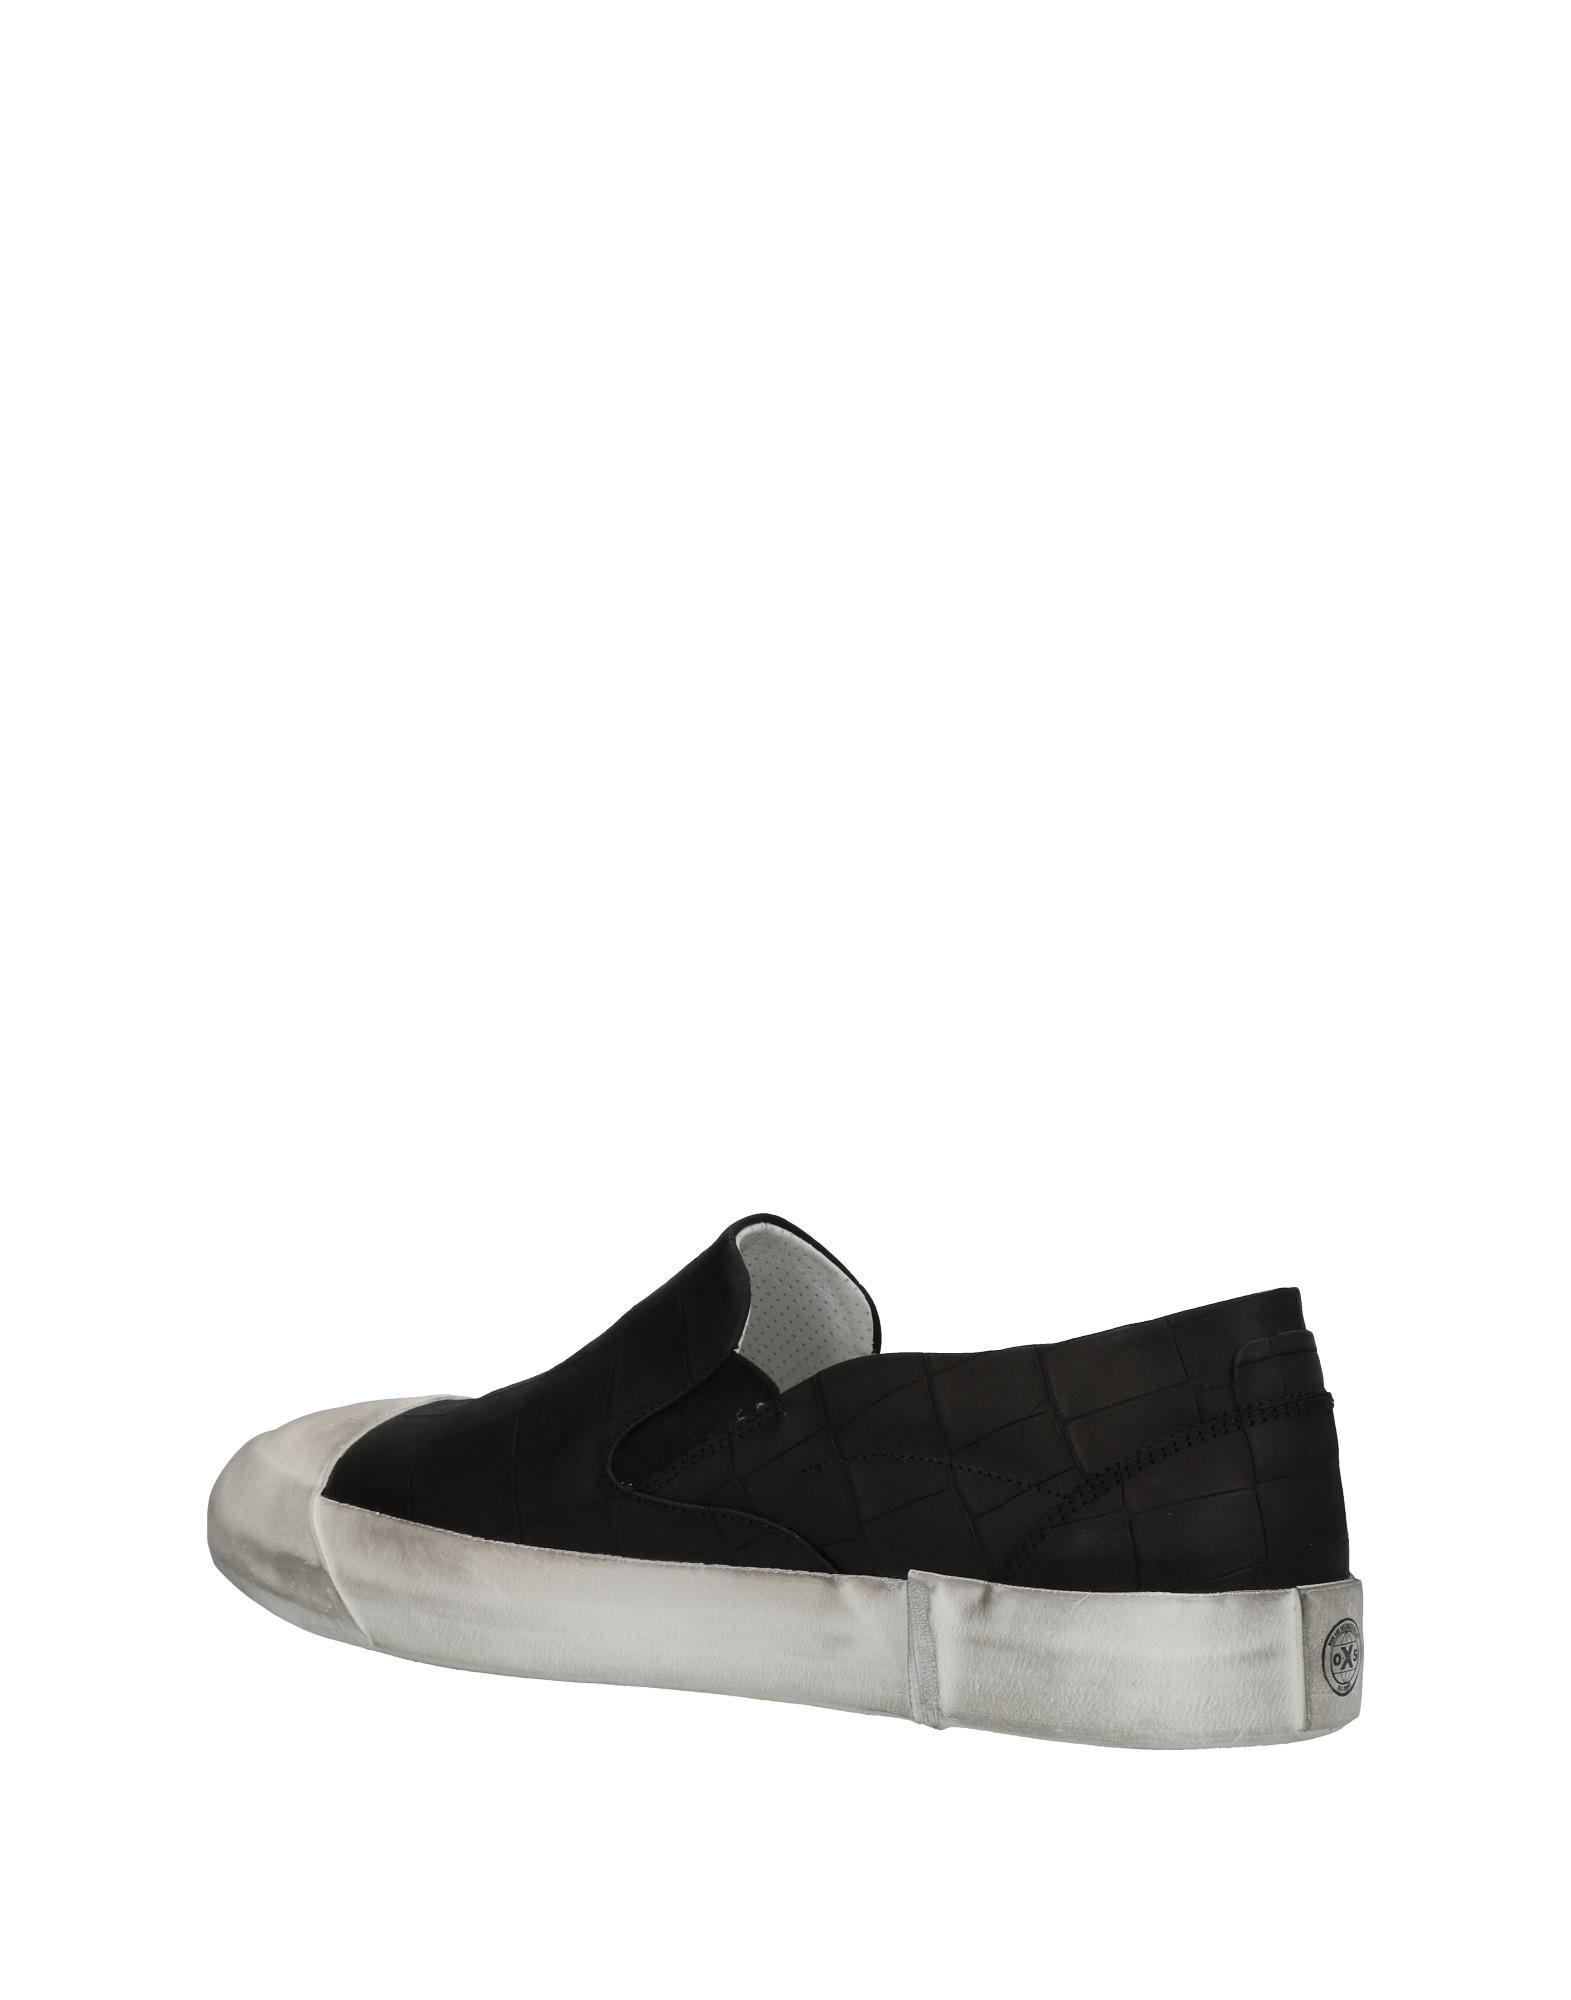 O.X.S. Sneakers Herren  beliebte 11278290KR Gute Qualität beliebte  Schuhe 704689